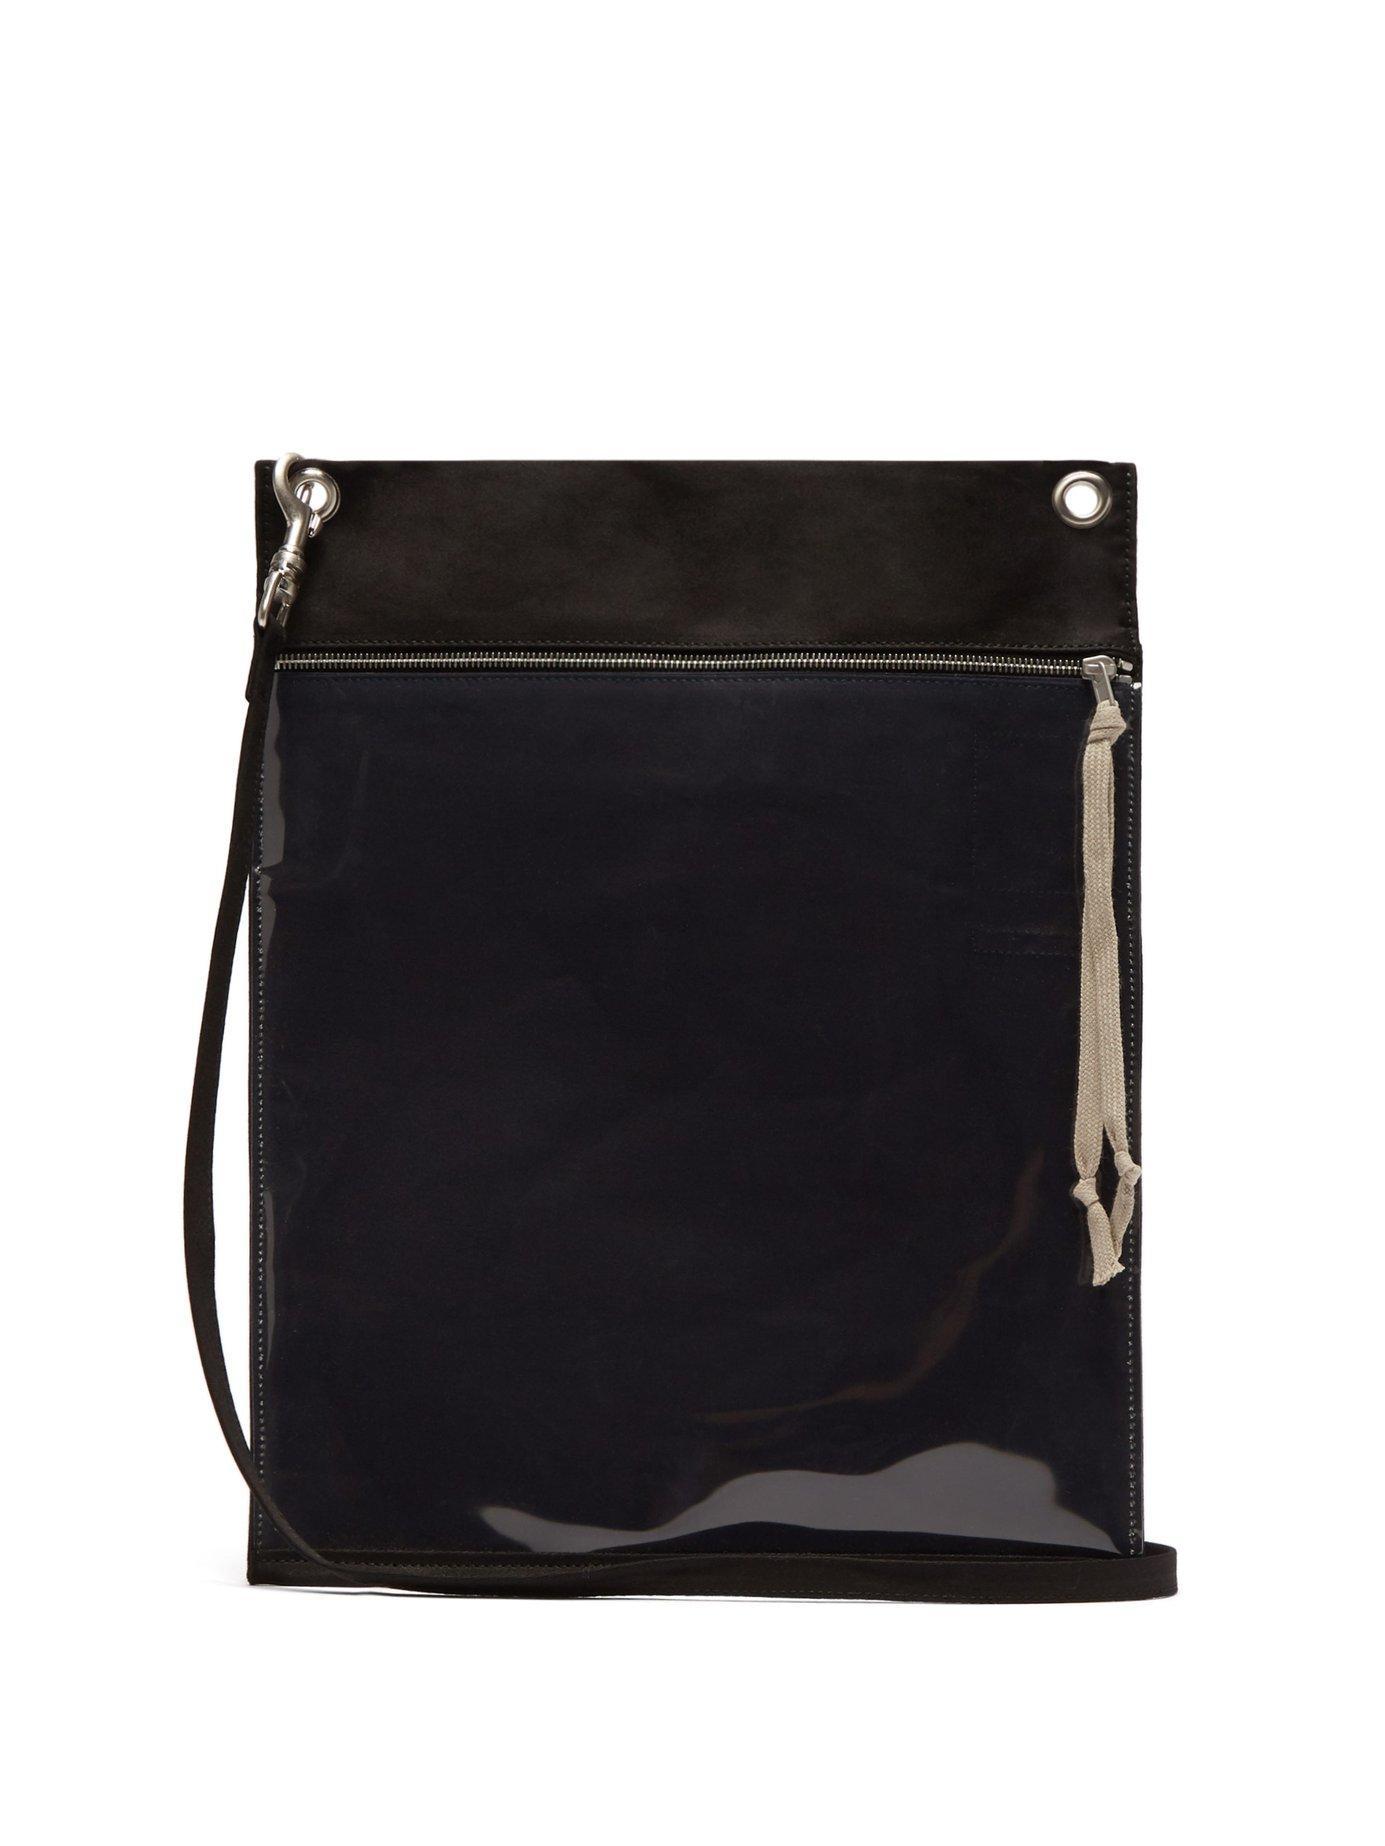 Lyst - Rick Owens Drkshdw Plastic Pocket Cotton Cross Body Bag in ... efda73737e468